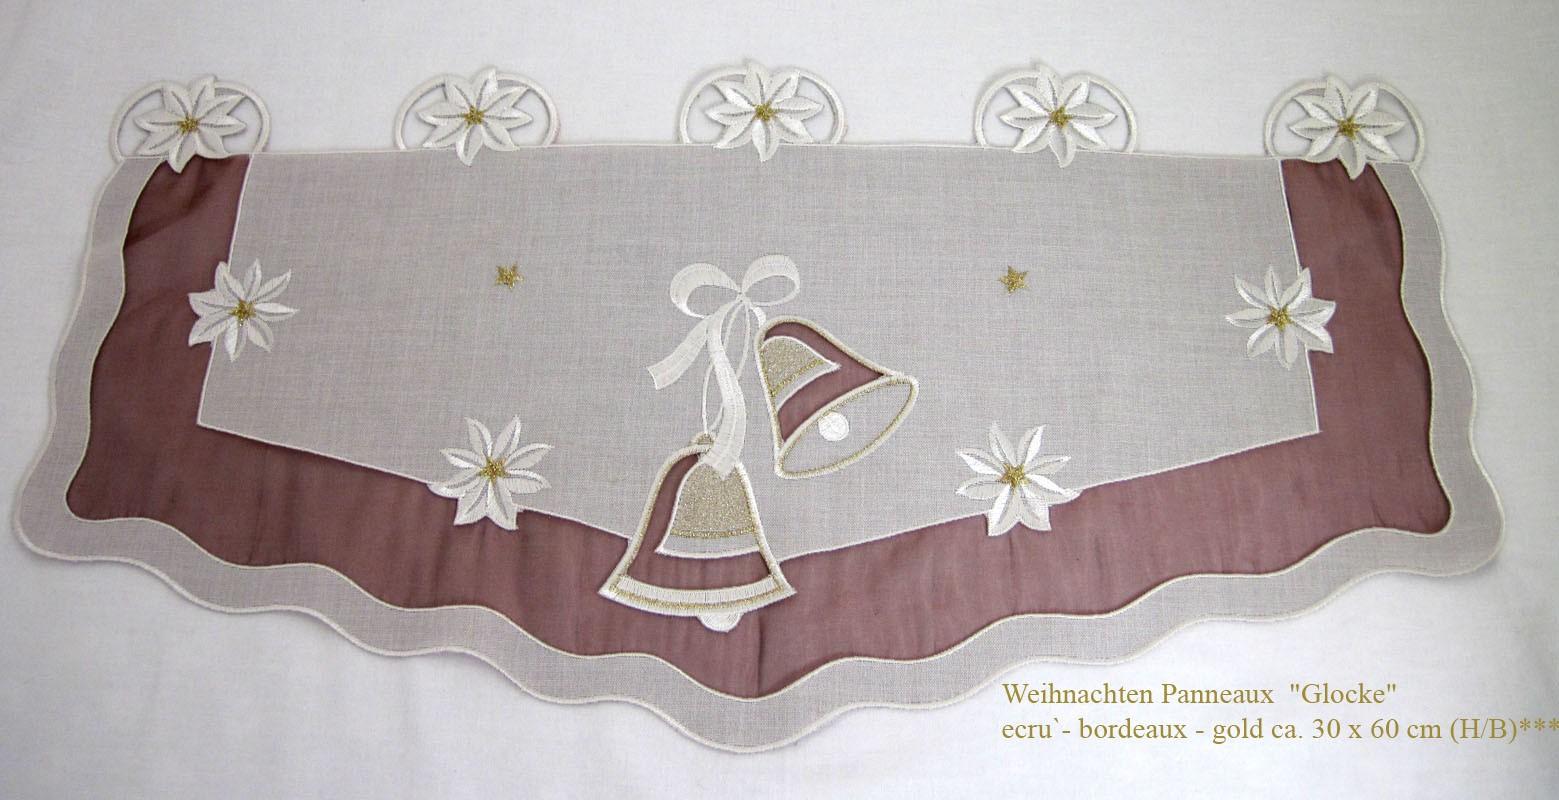 "Weihnachten Panneaux  ""Glocke"" ecru`-bordeaux-gold ca. 30 x 60 cm (H/B)"